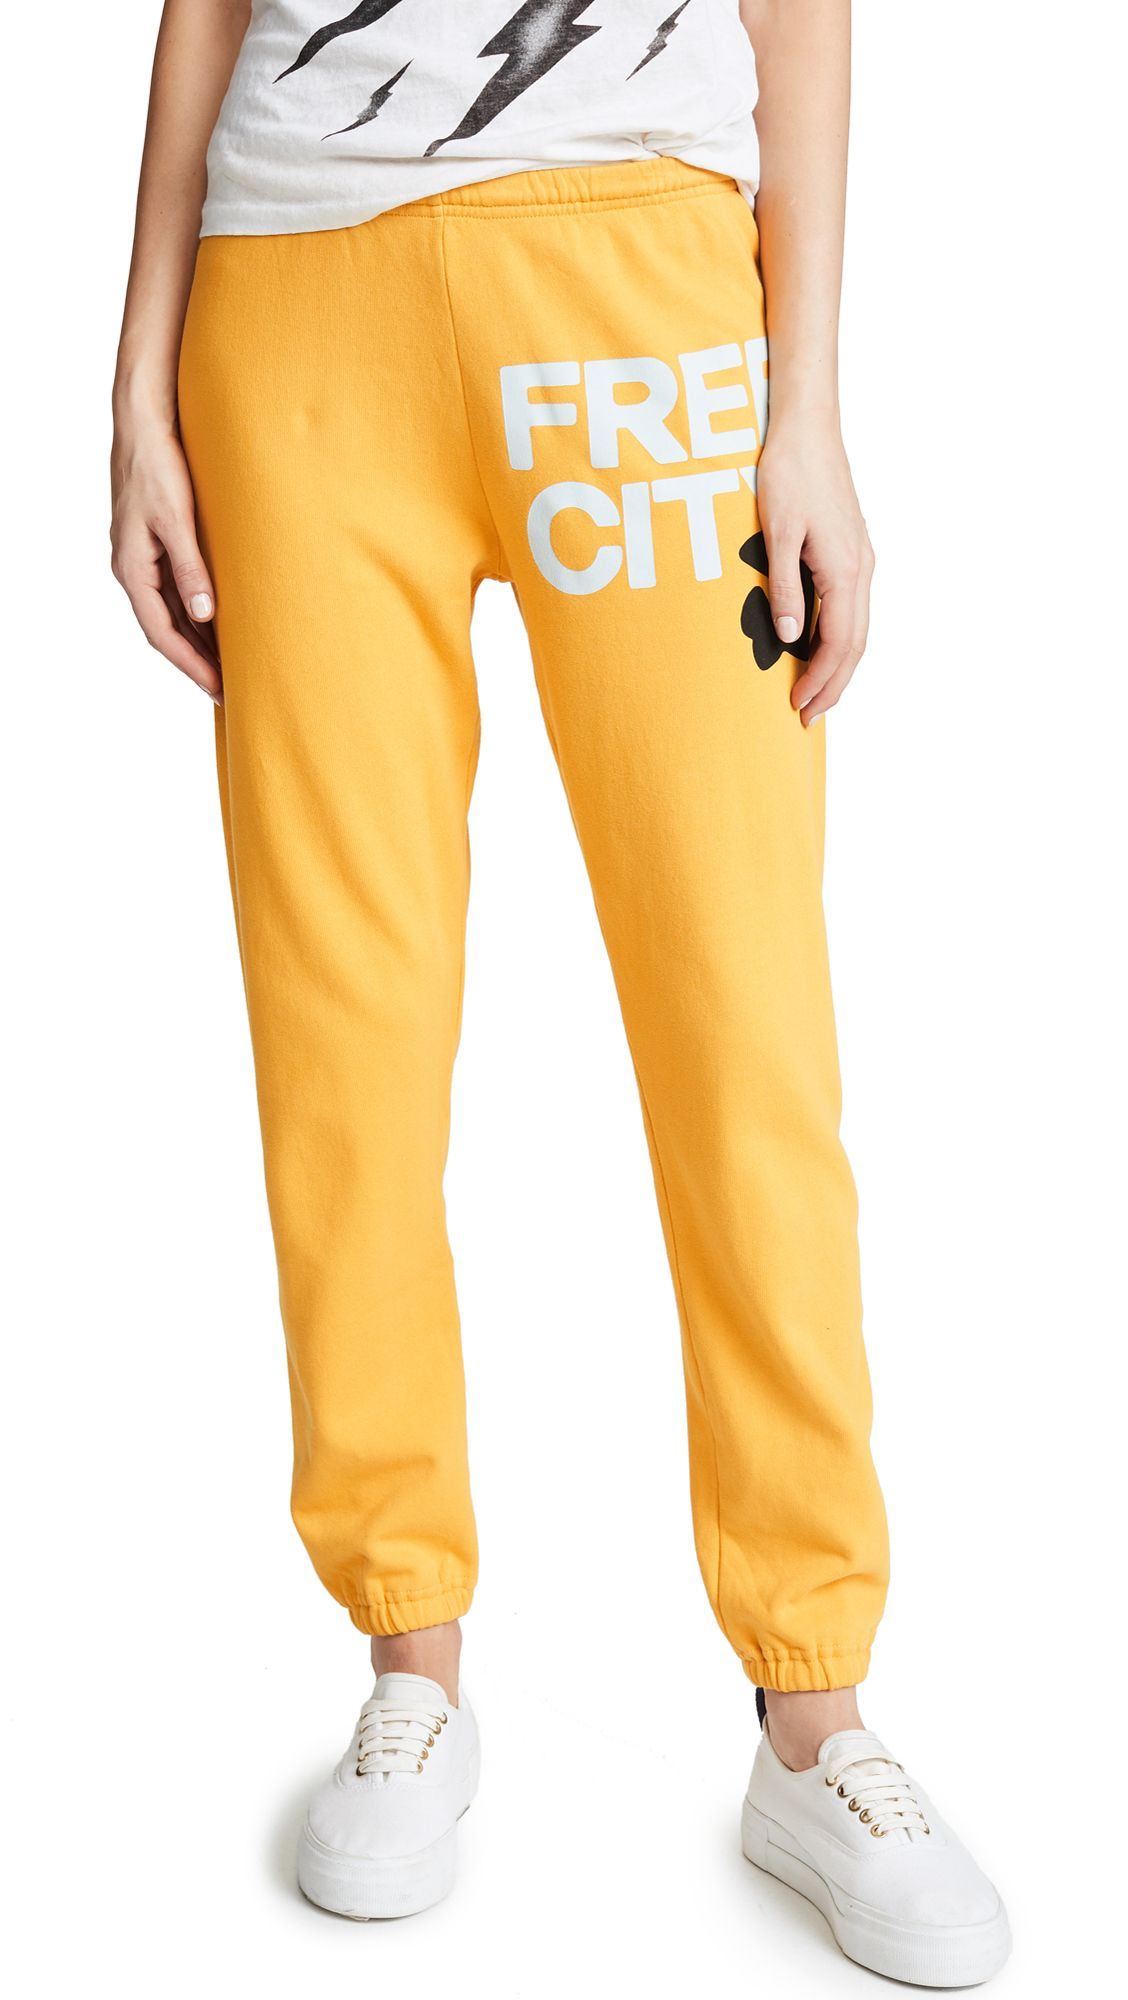 Freecity Sweatpants In Yellow Machine Modesens Sweatpants Yellow French Terry